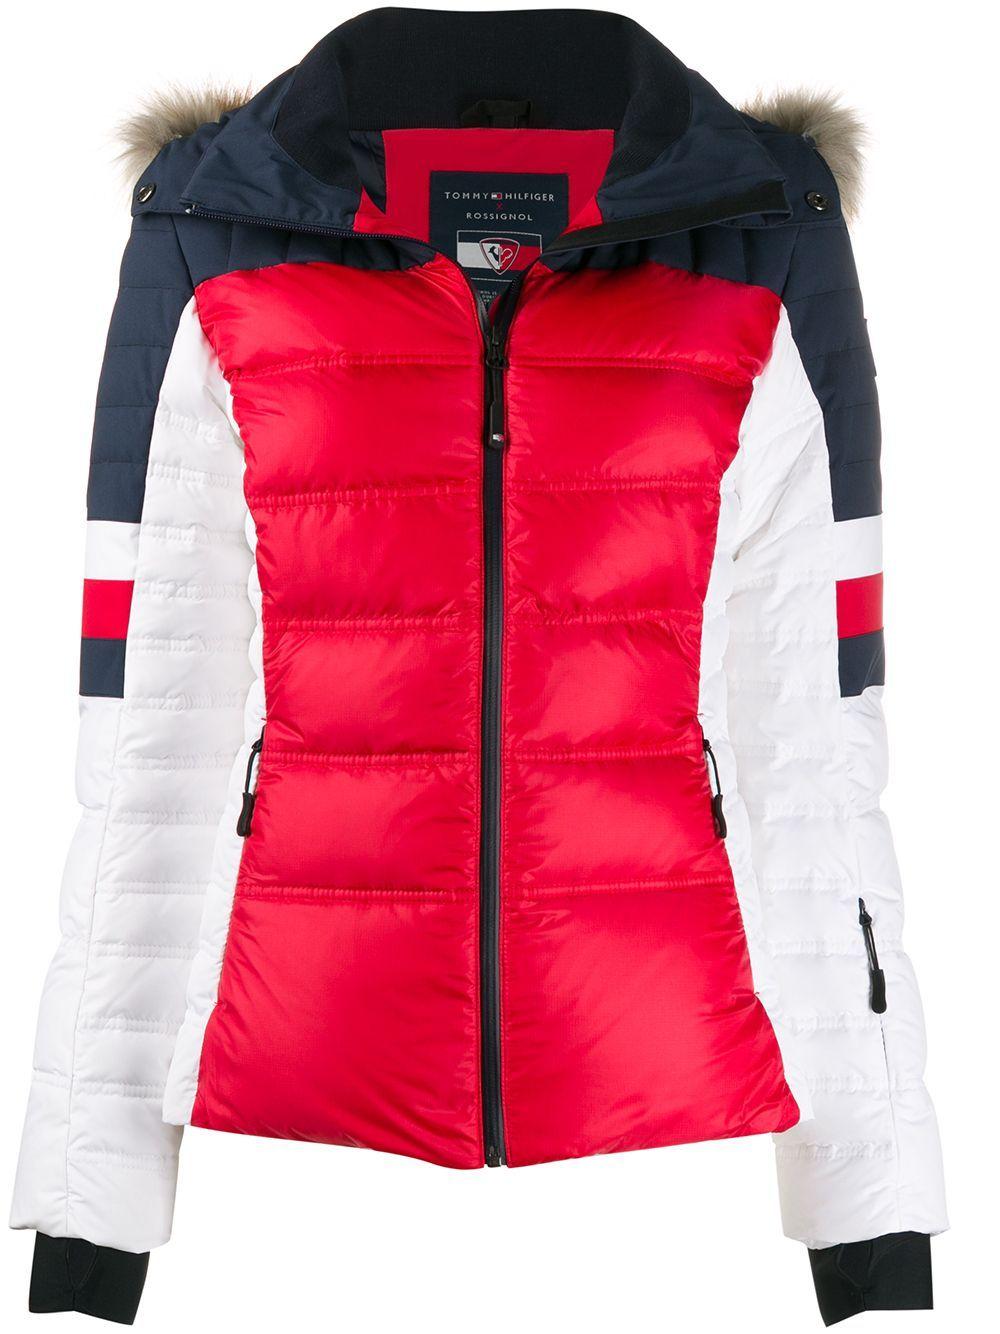 Tommy Hilfiger Colour Blocked Padded Jacket Blue In 2020 Tommy Hilfiger Jackets Padded Jacket